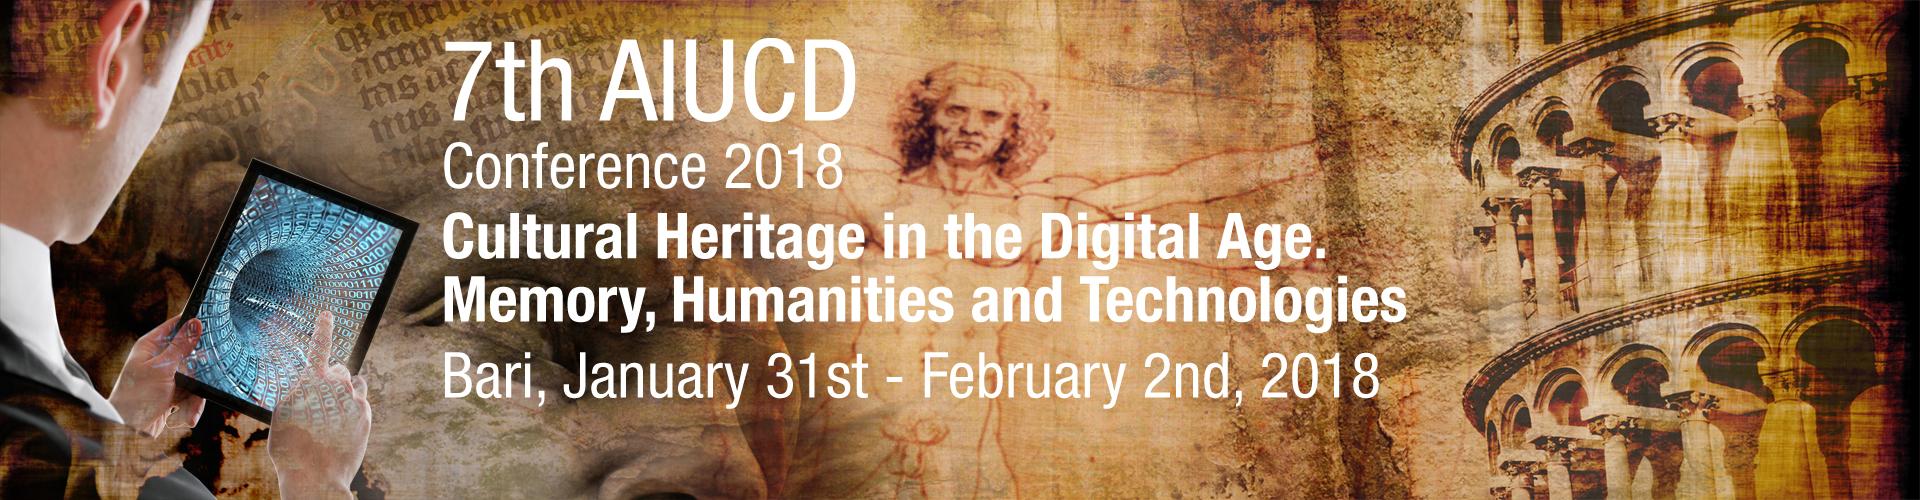 Conferenza AIUCD 2018: Bari, 31 gennaio – 2 febbraio 2018